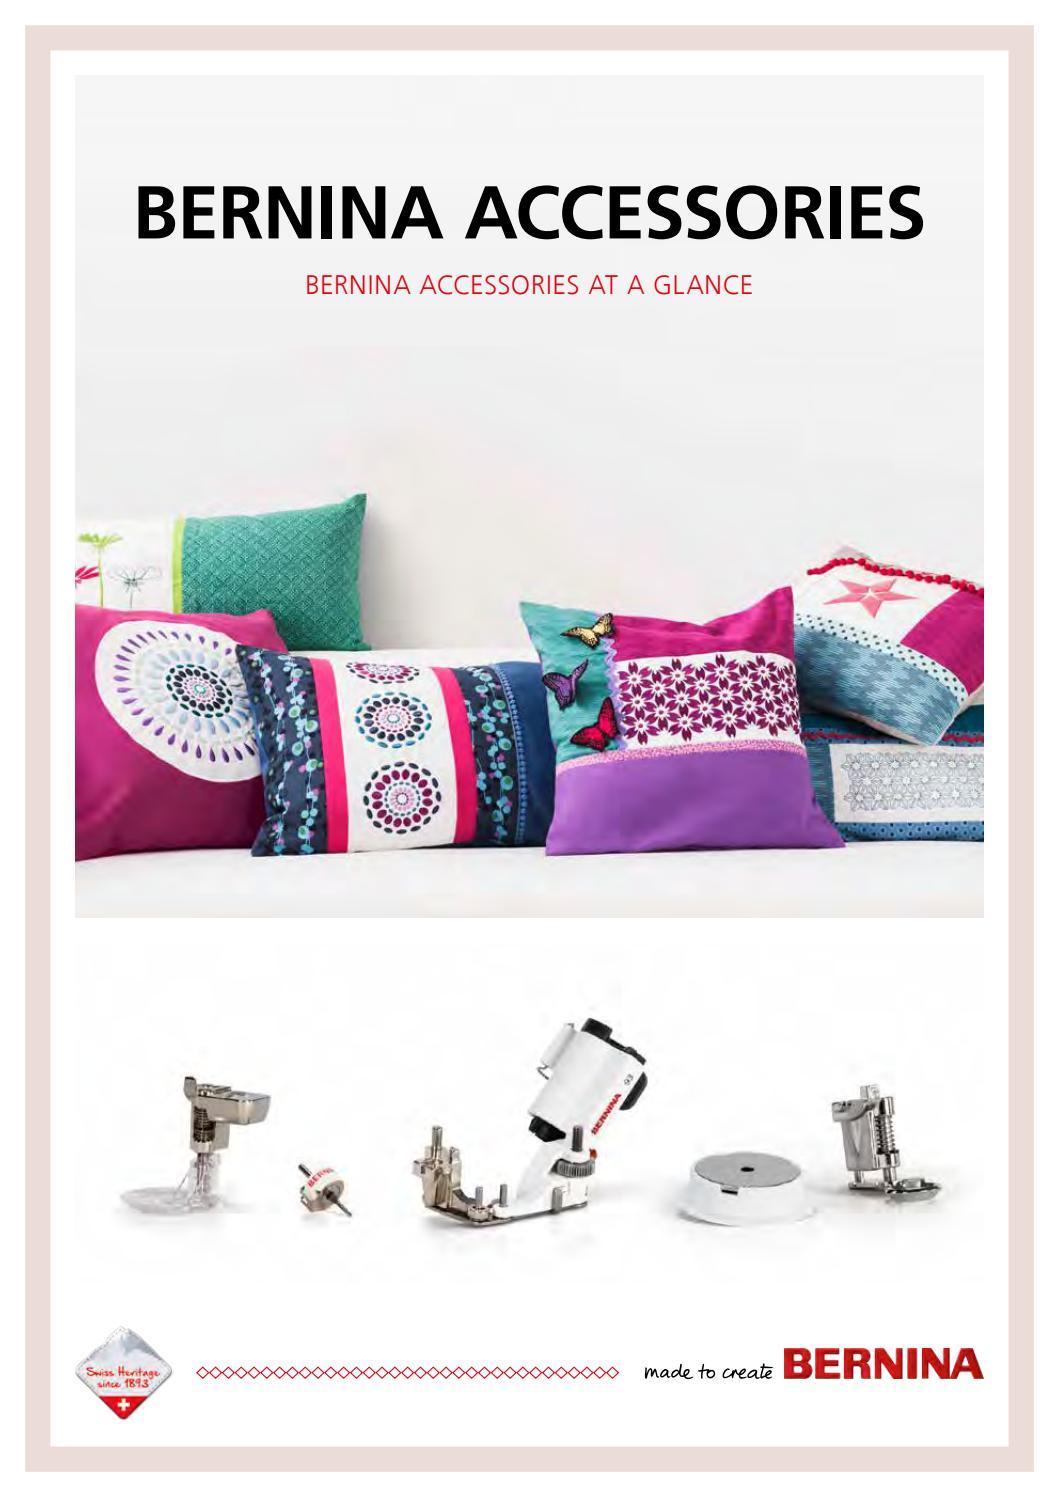 Large Universal Bobbin Box case for BERNINA Holds 25 Embroidery